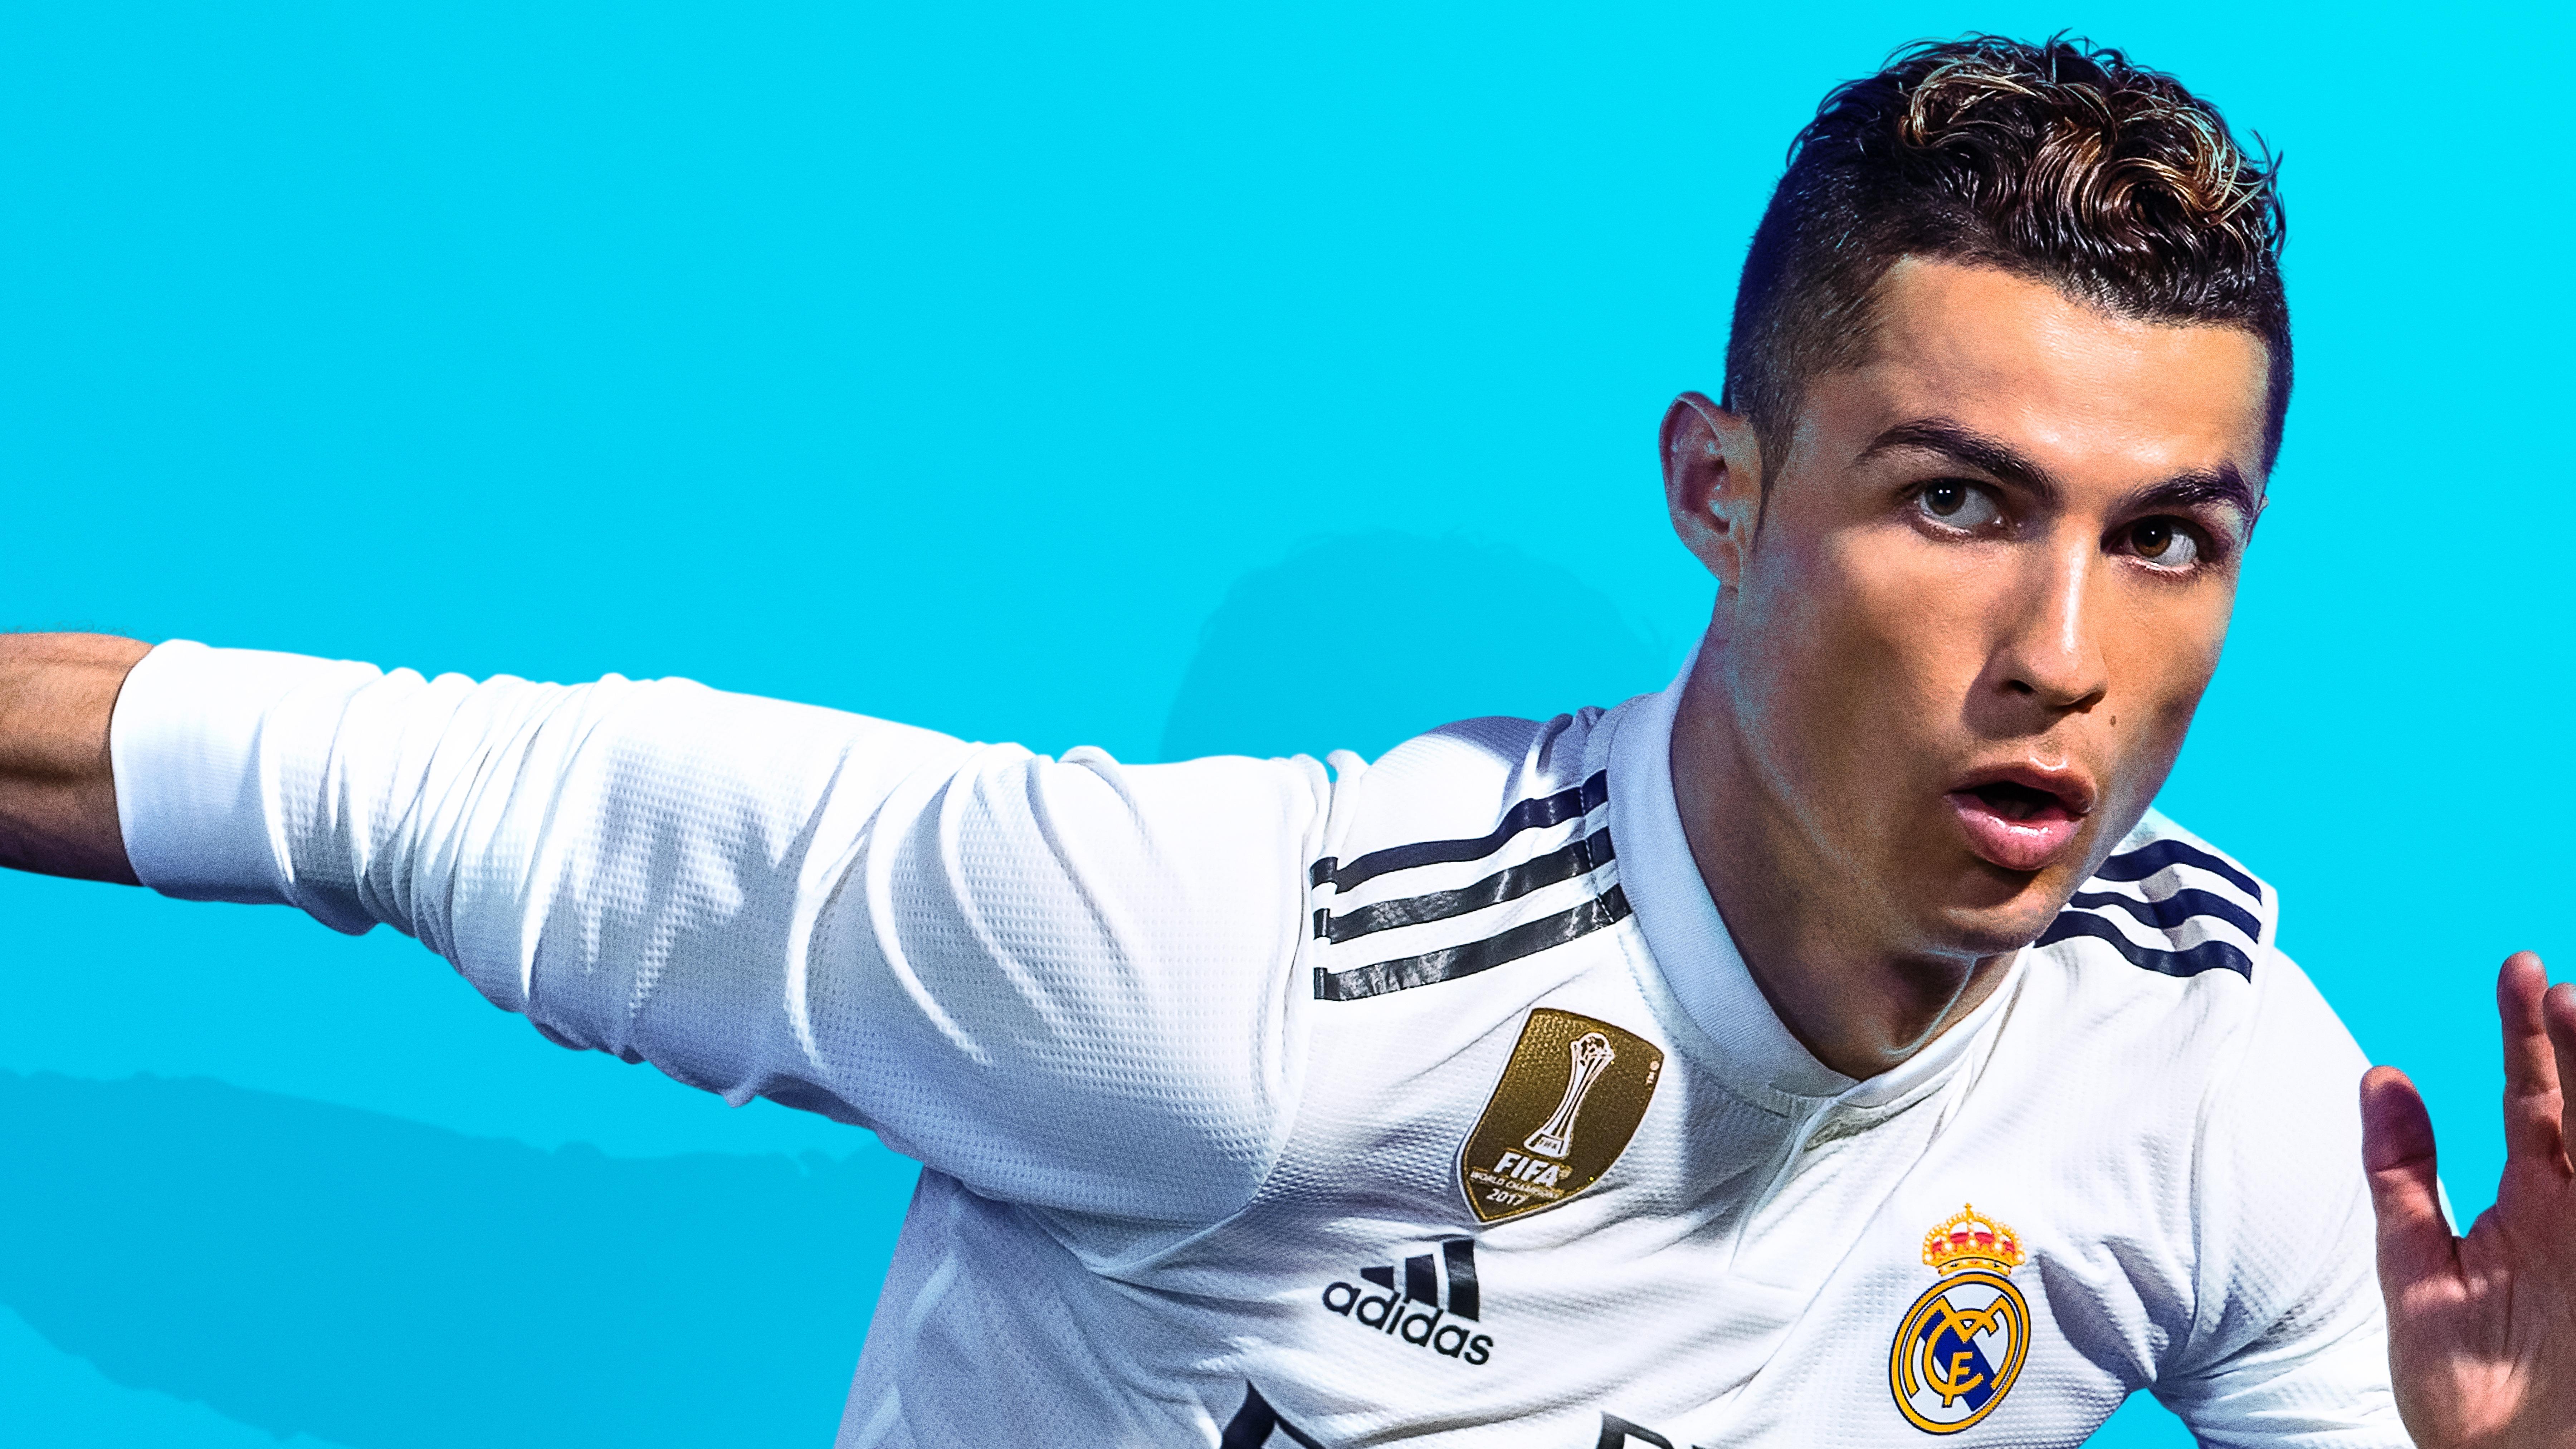 Cristiano Ronaldo Fifa 19 8k Hd Games 4k Wallpapers